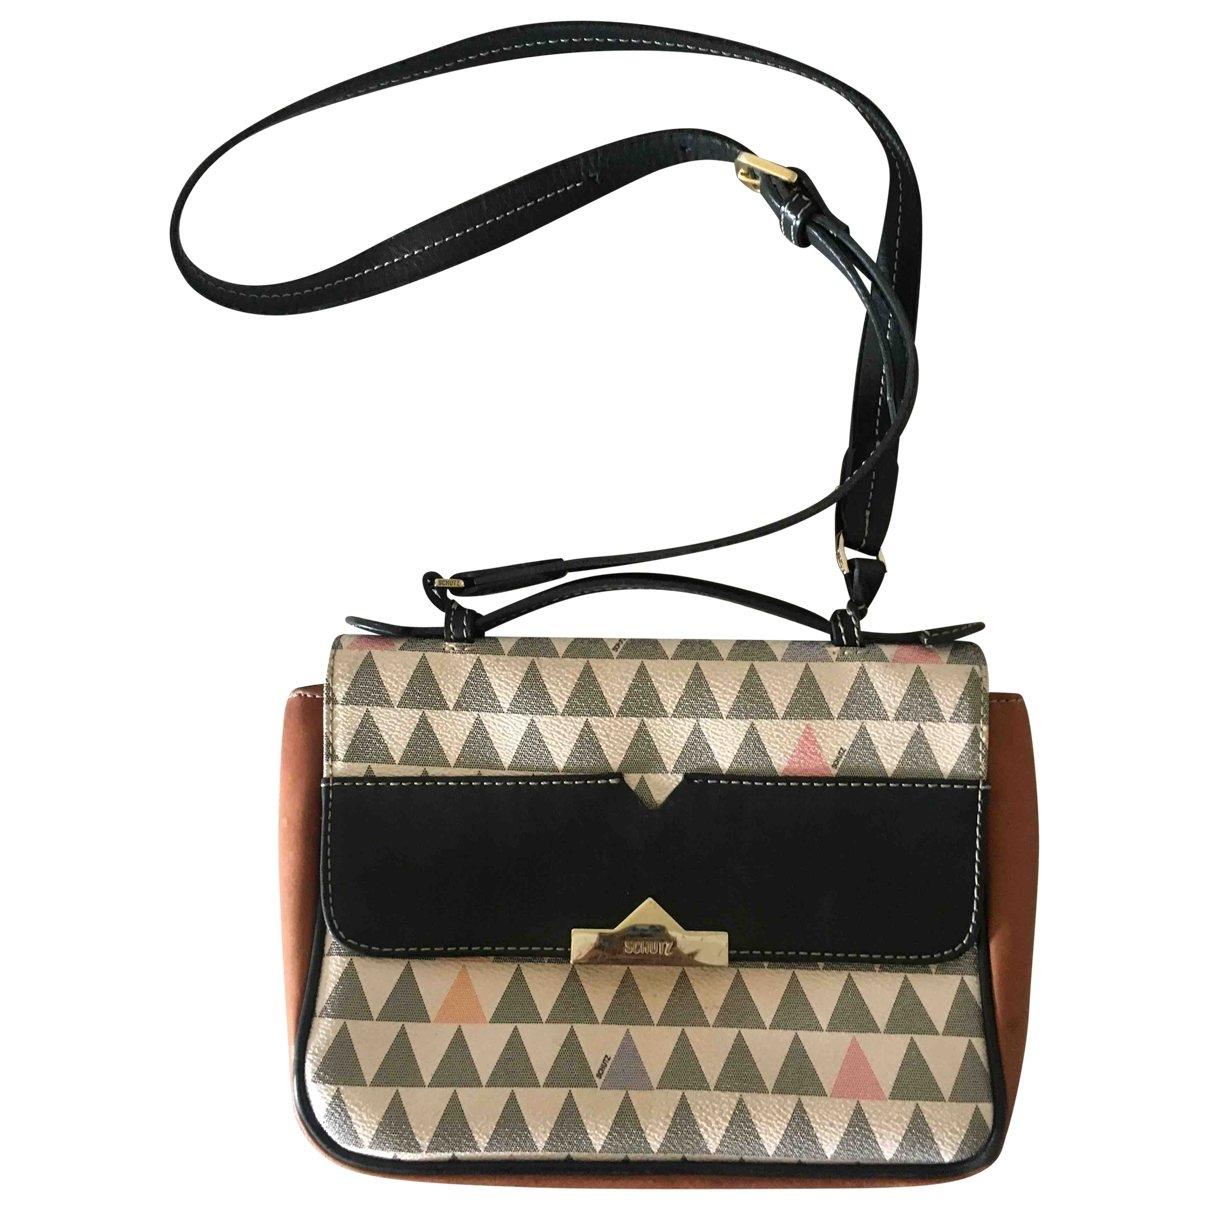 Schutz \N Handtasche in  Bunt Lackleder